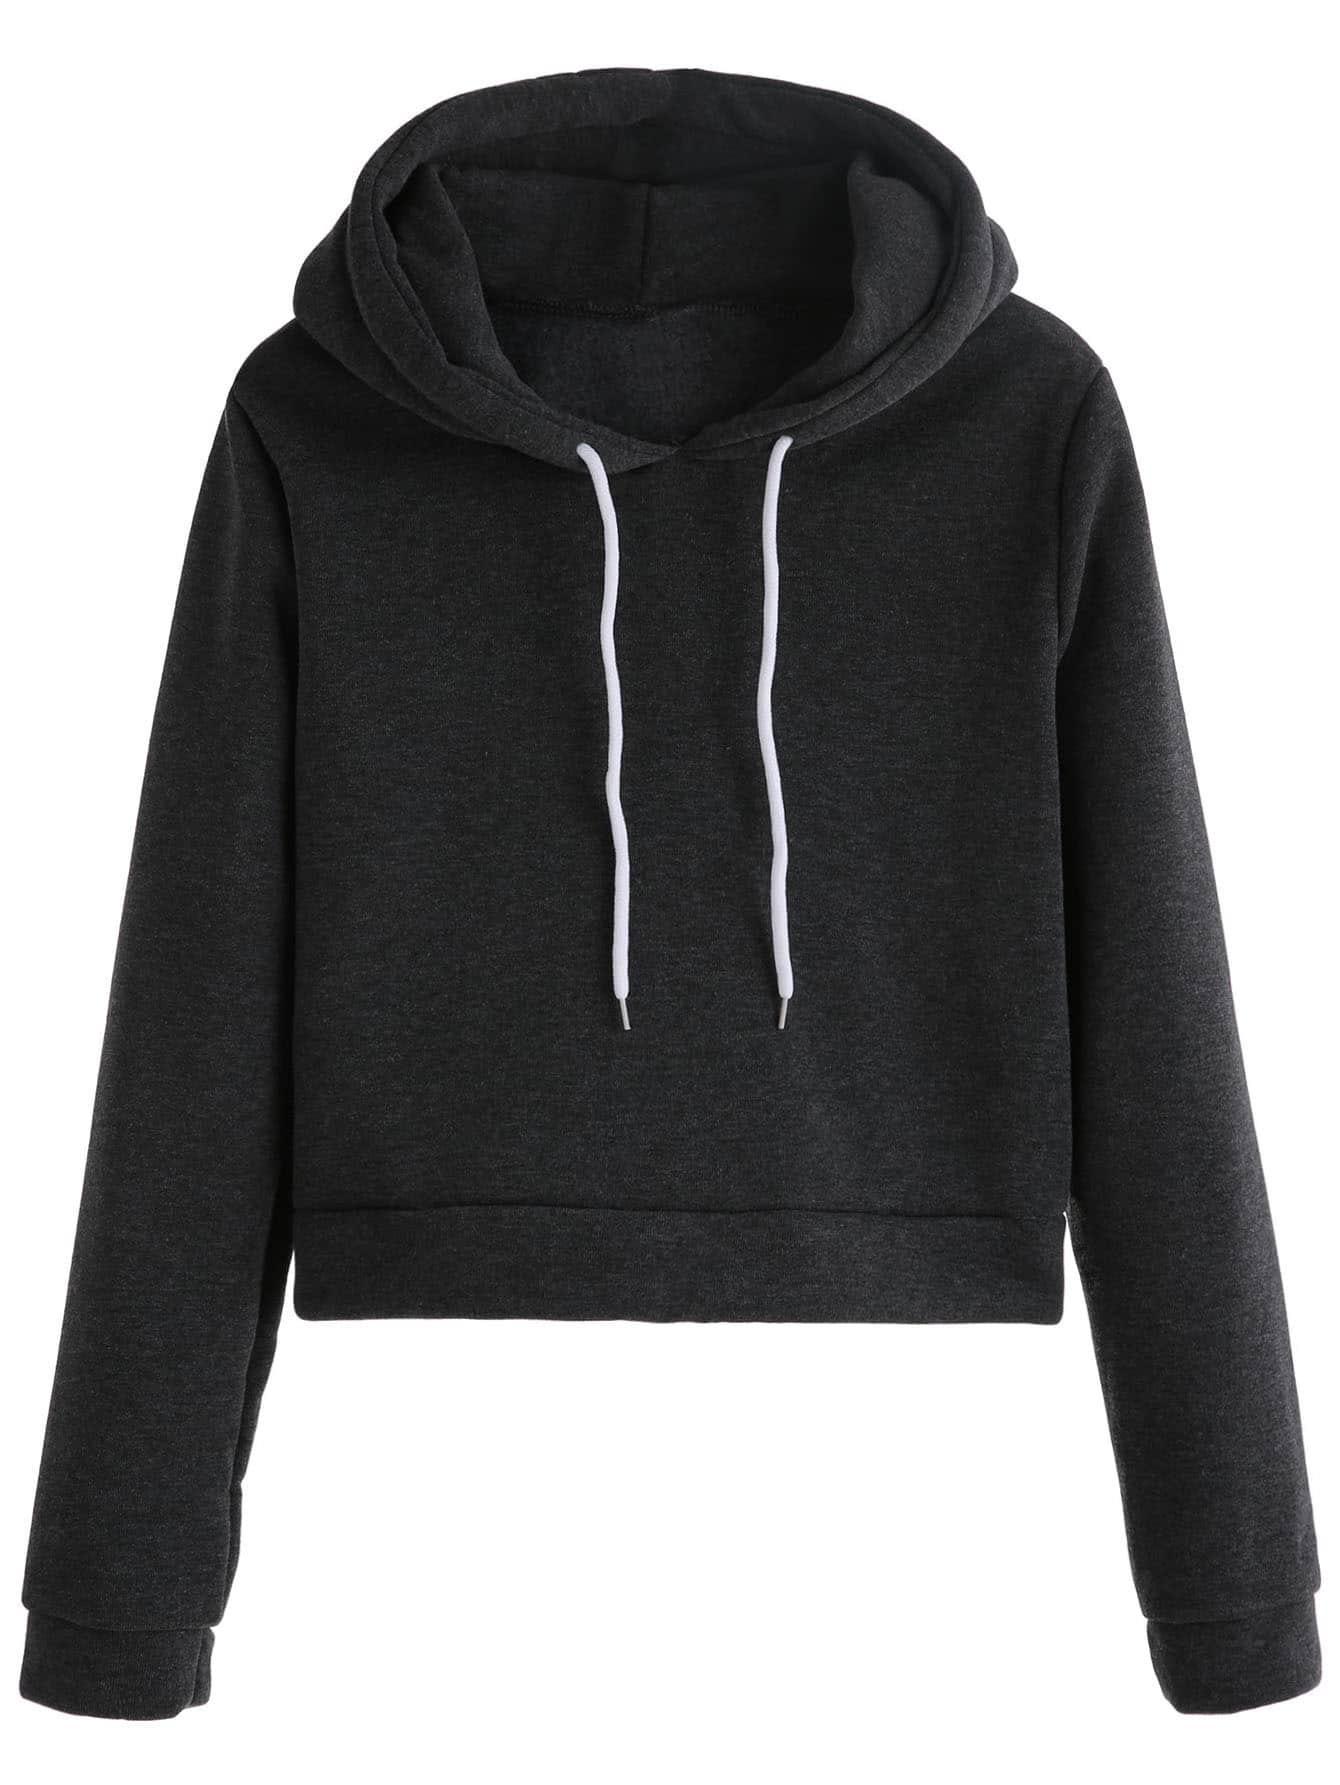 Dark Grey Drawstring Hooded Sweatshirt